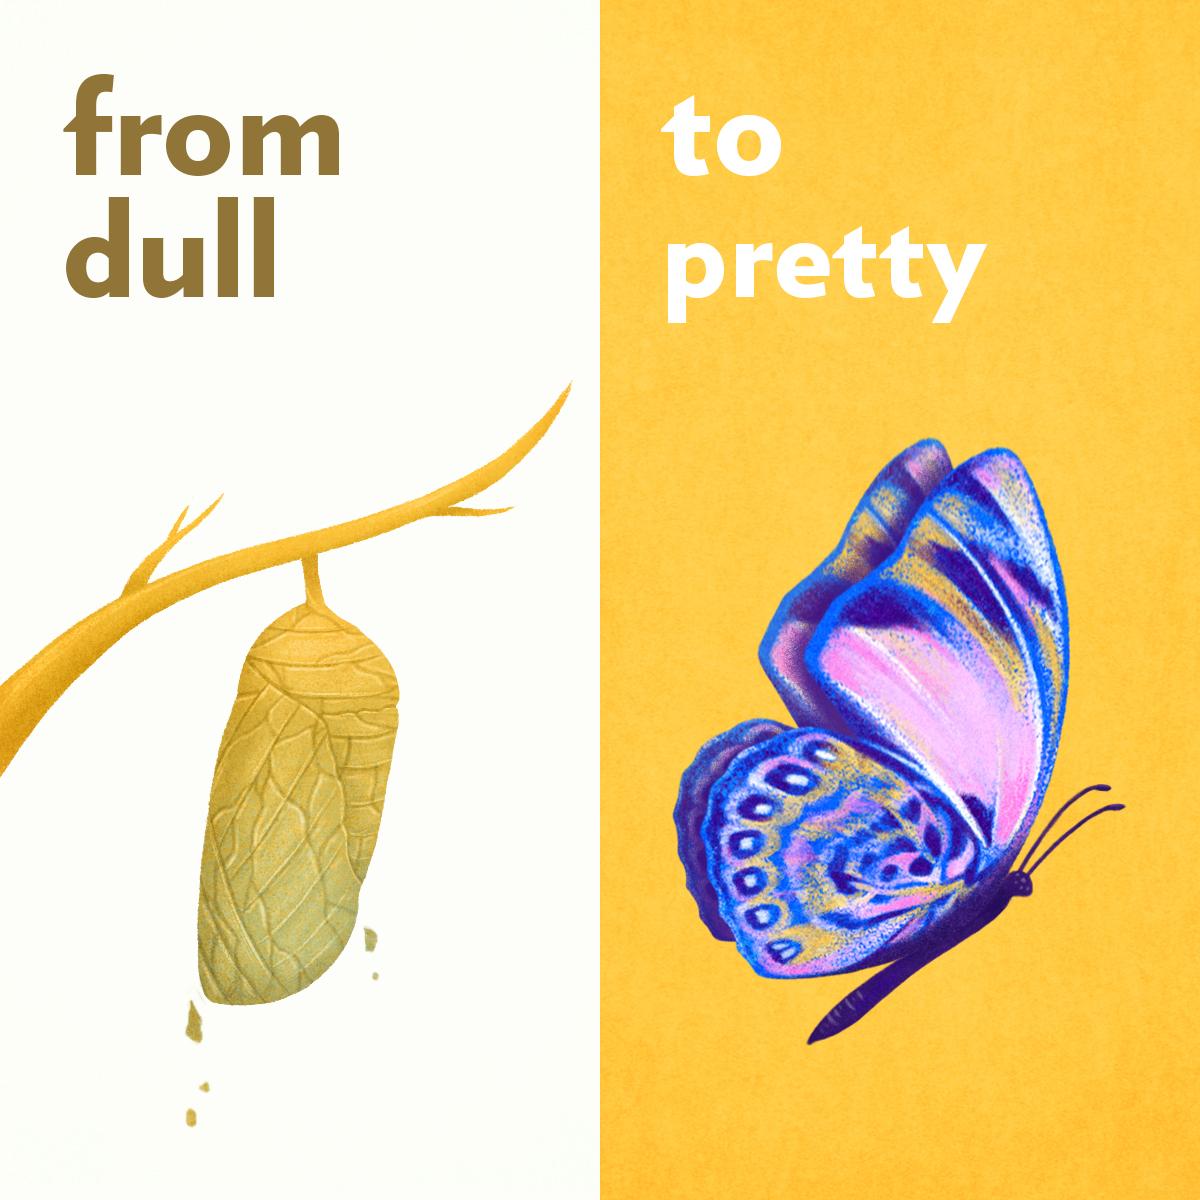 Dull-Pretty_Instagram.jpg